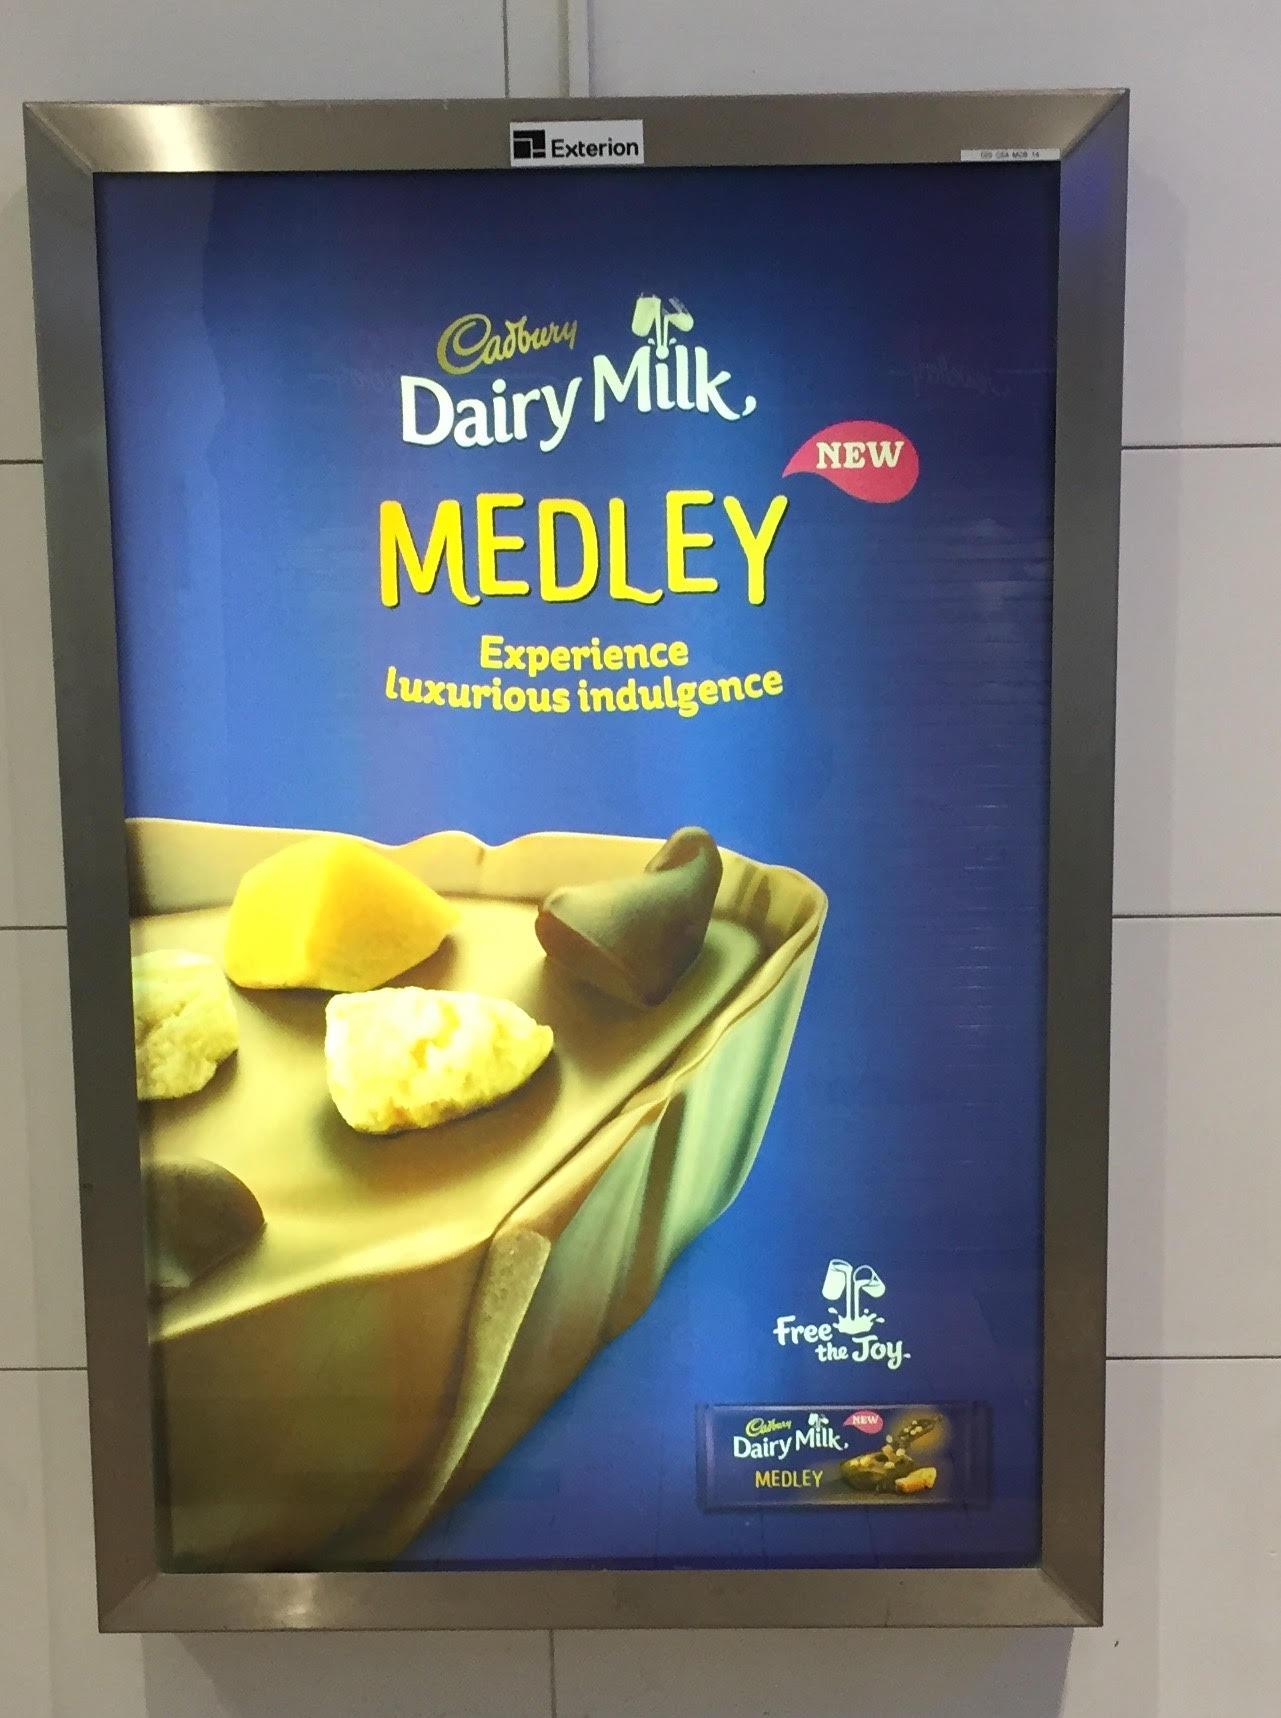 Cadbury Dairy Milk Medley – experience luxurious indulgence